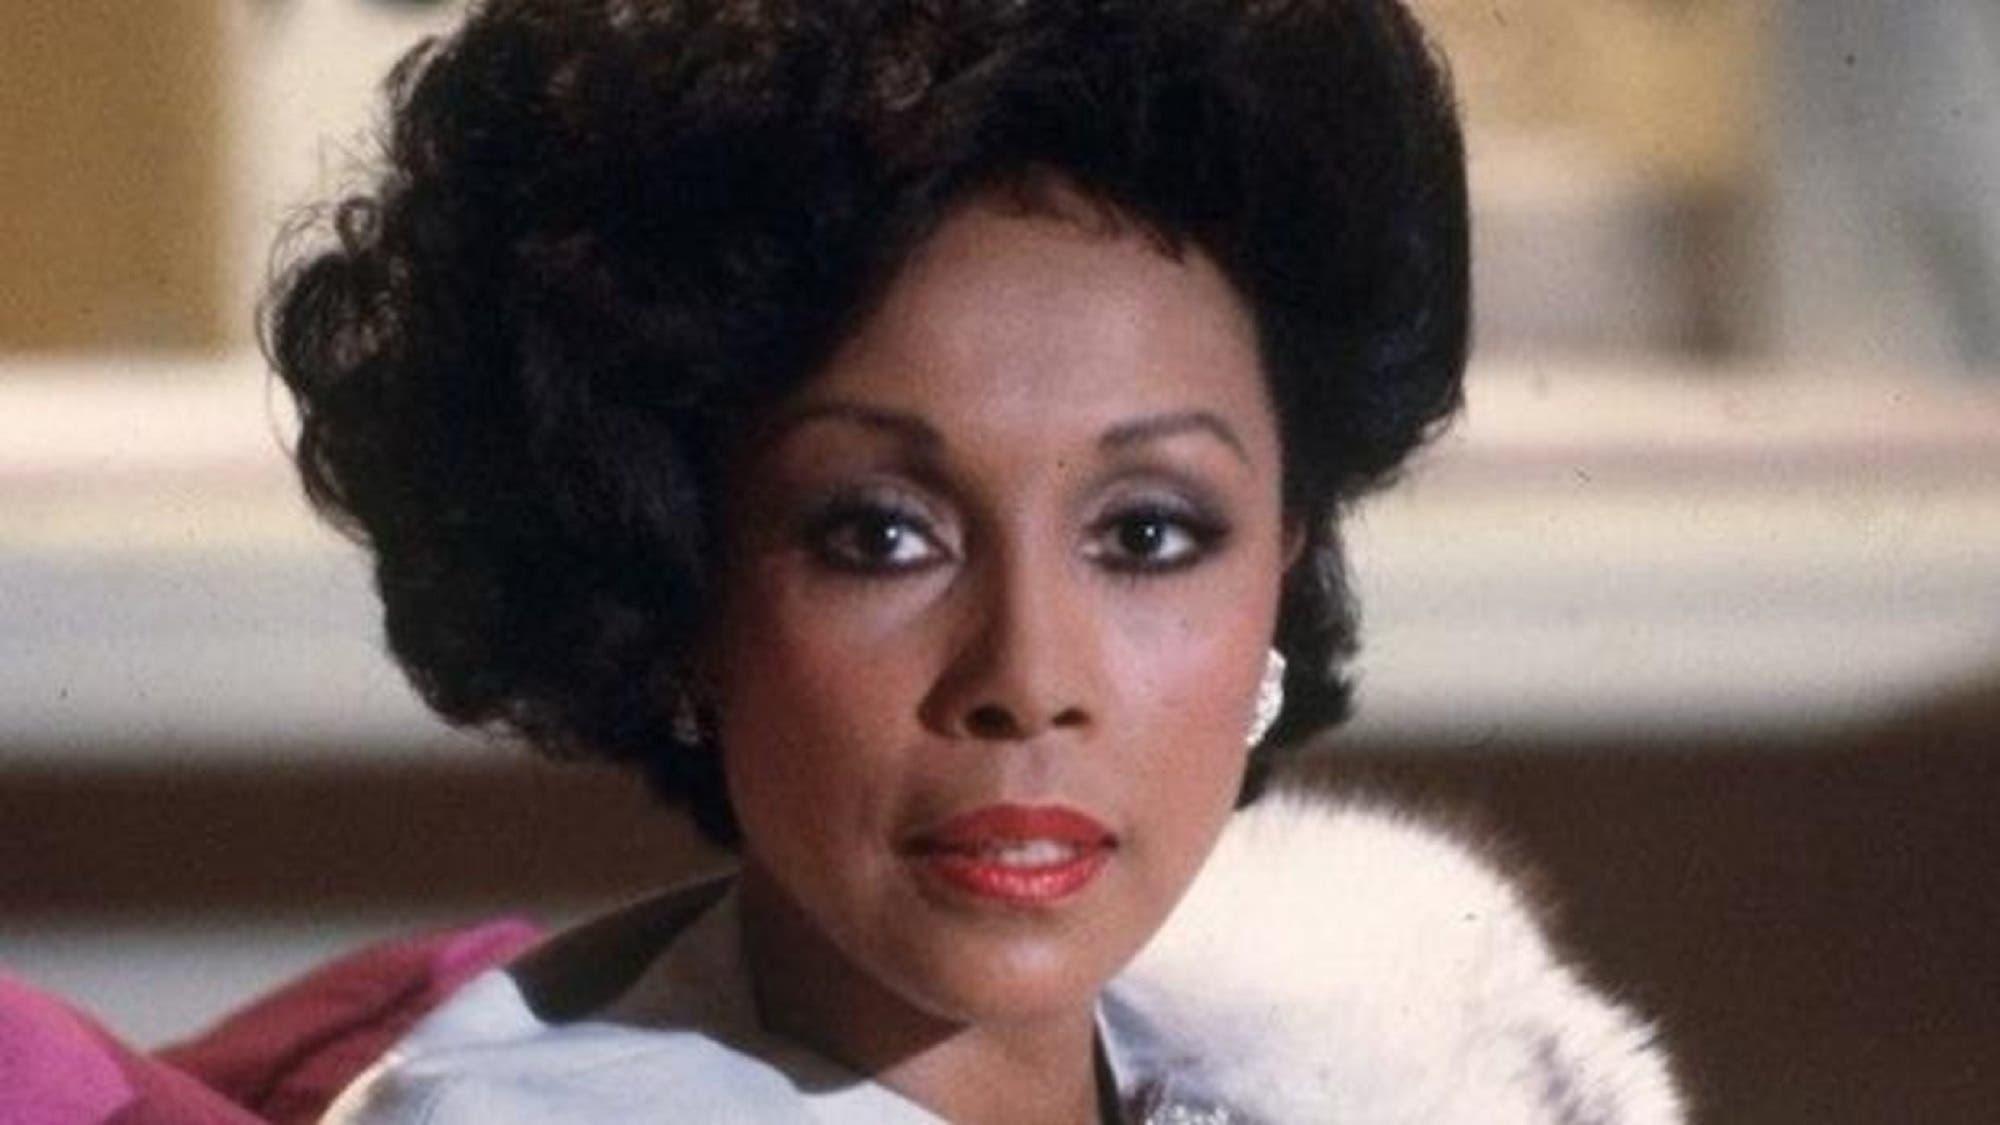 Murió Diahann Carroll, la actriz afroamericana de Dinastía que rompió barreras